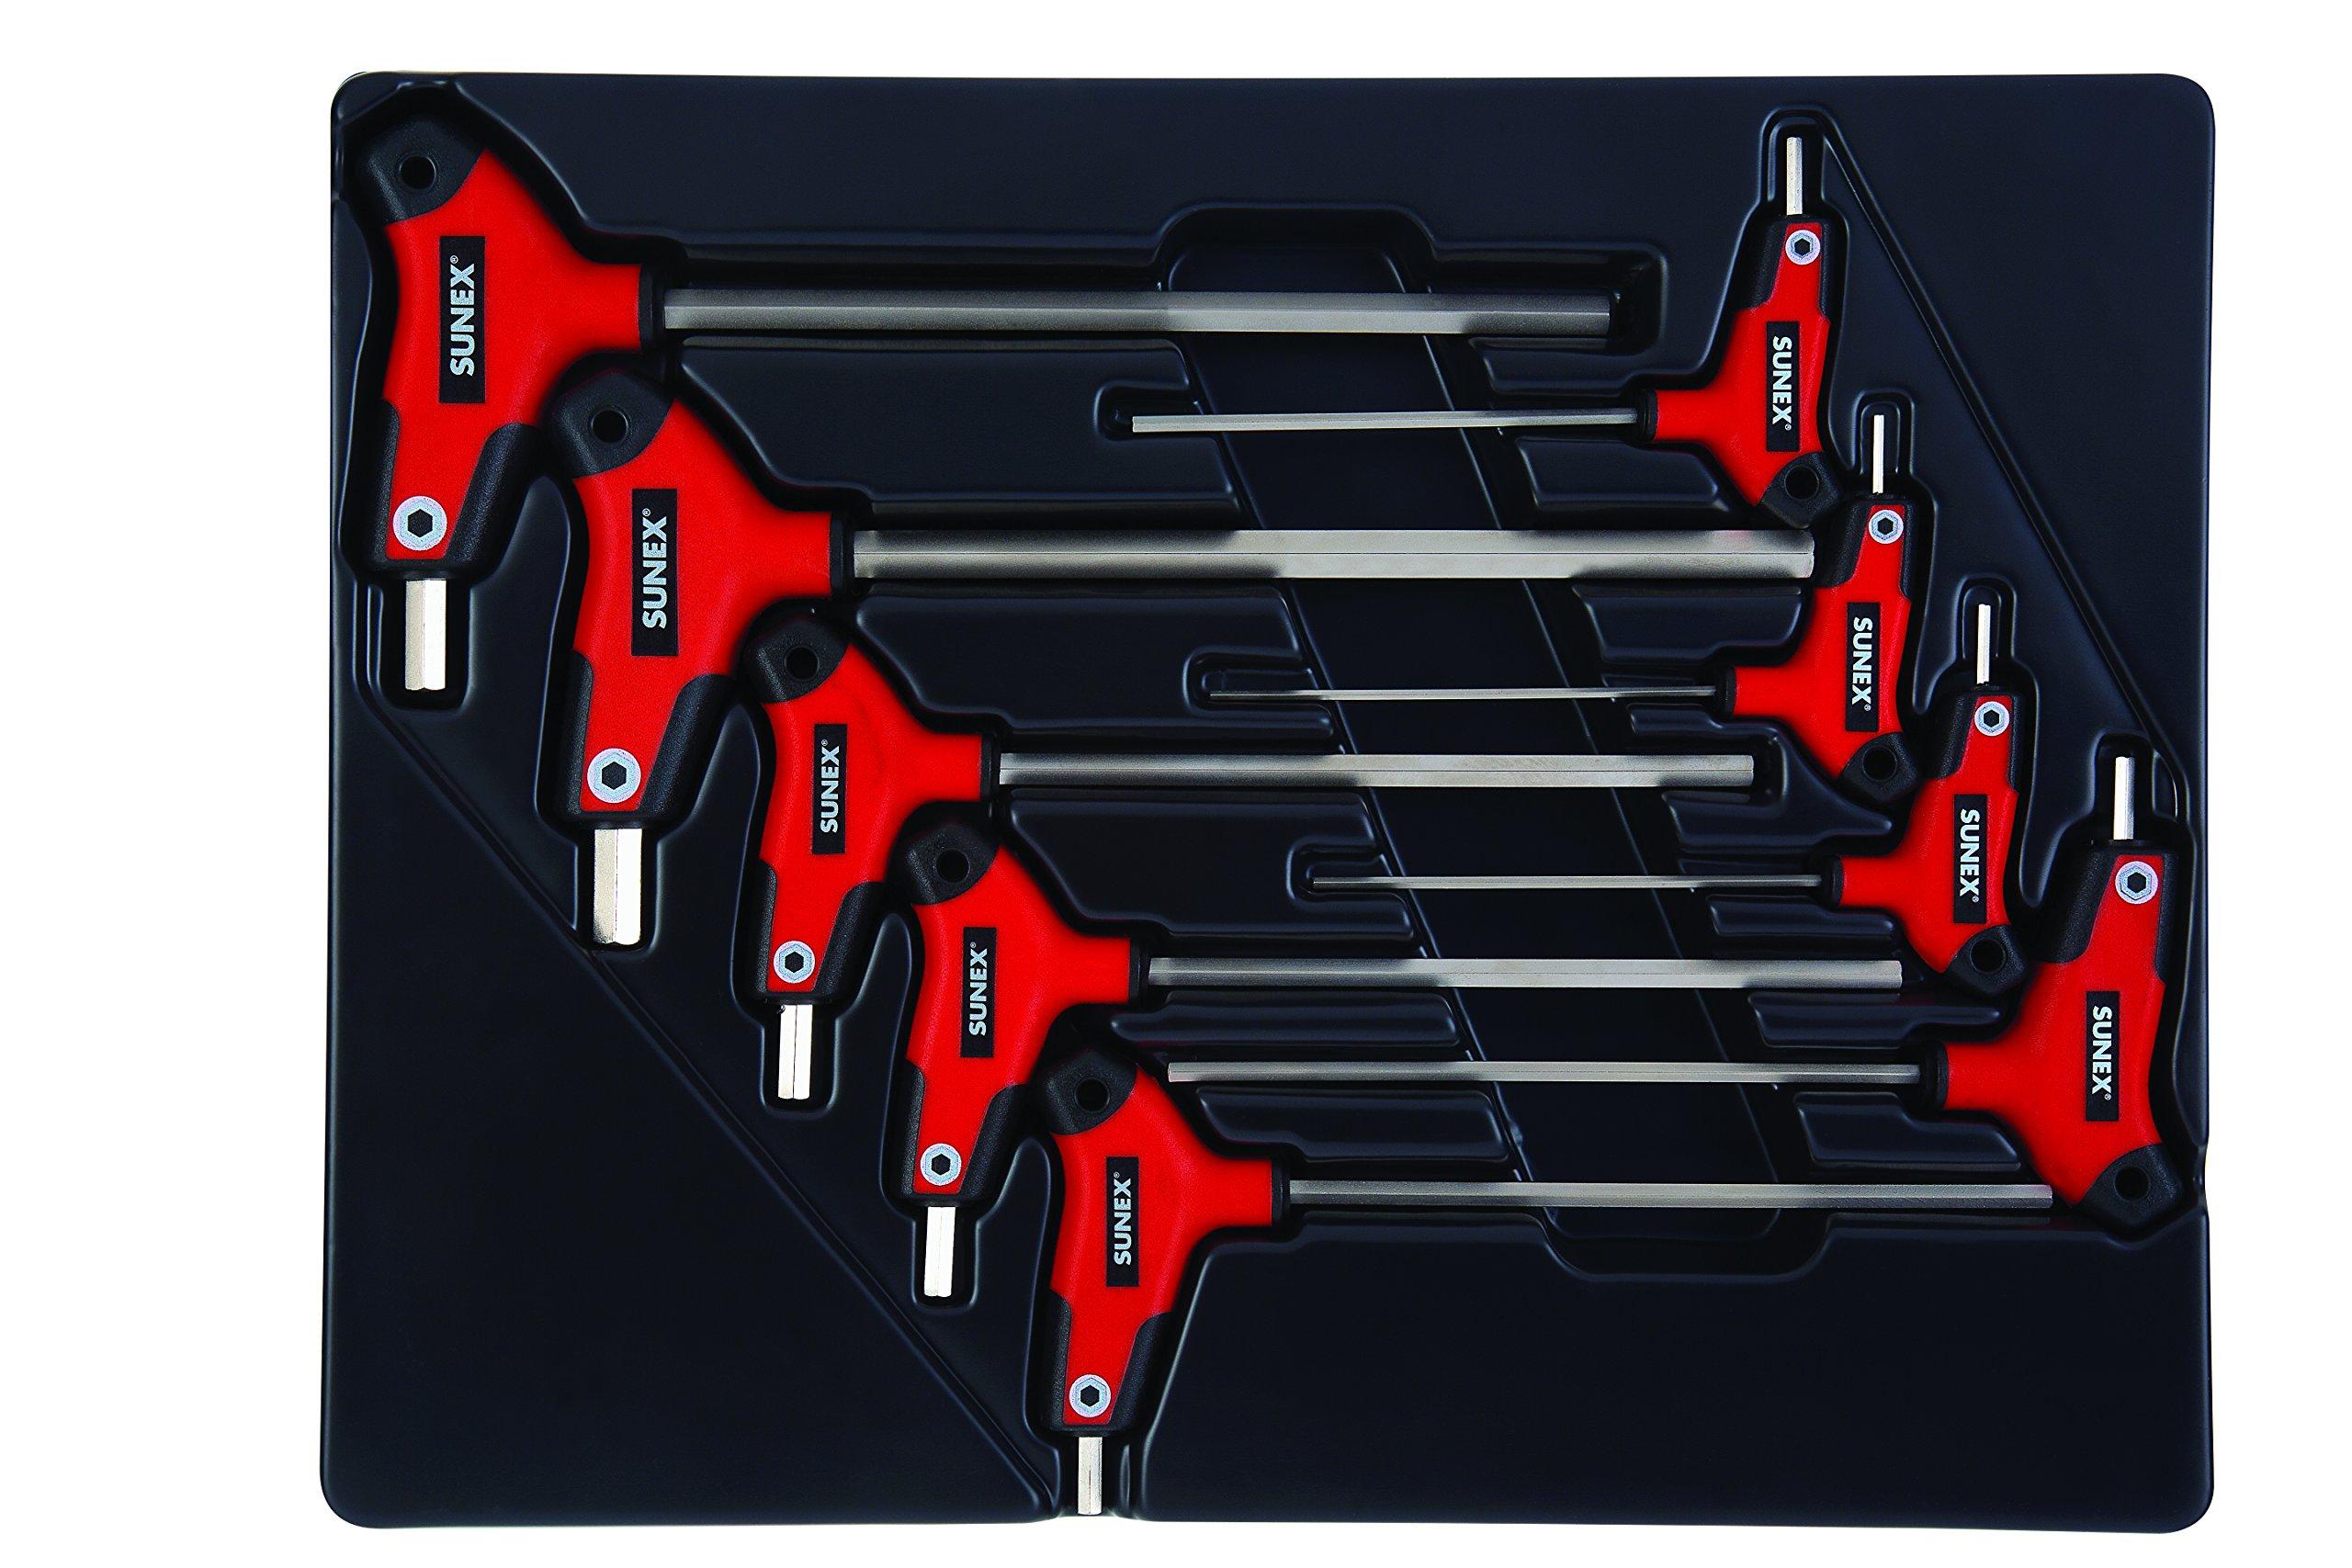 Sunex 9859 T-Handle - SAE - Hex Key Set (9 Piece) by Sunex Tools